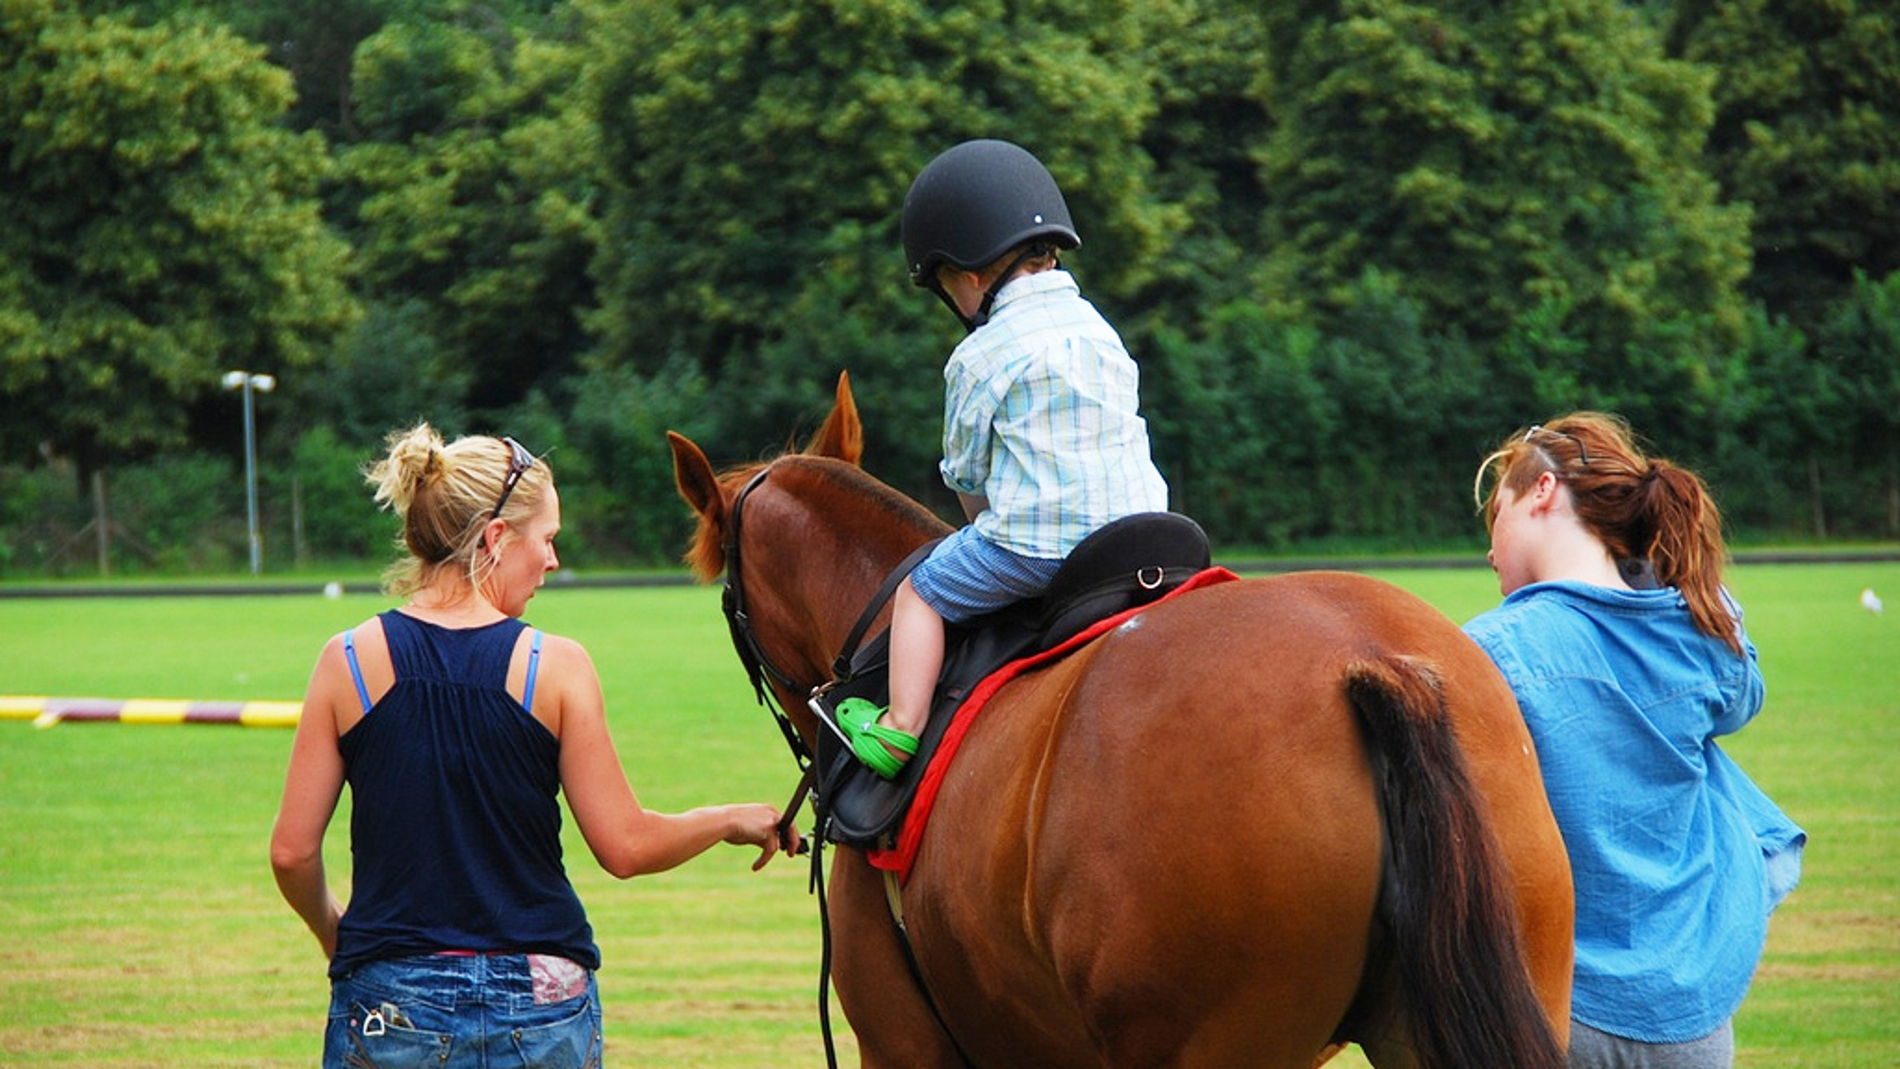 Montar a caballo es una terapia compleme